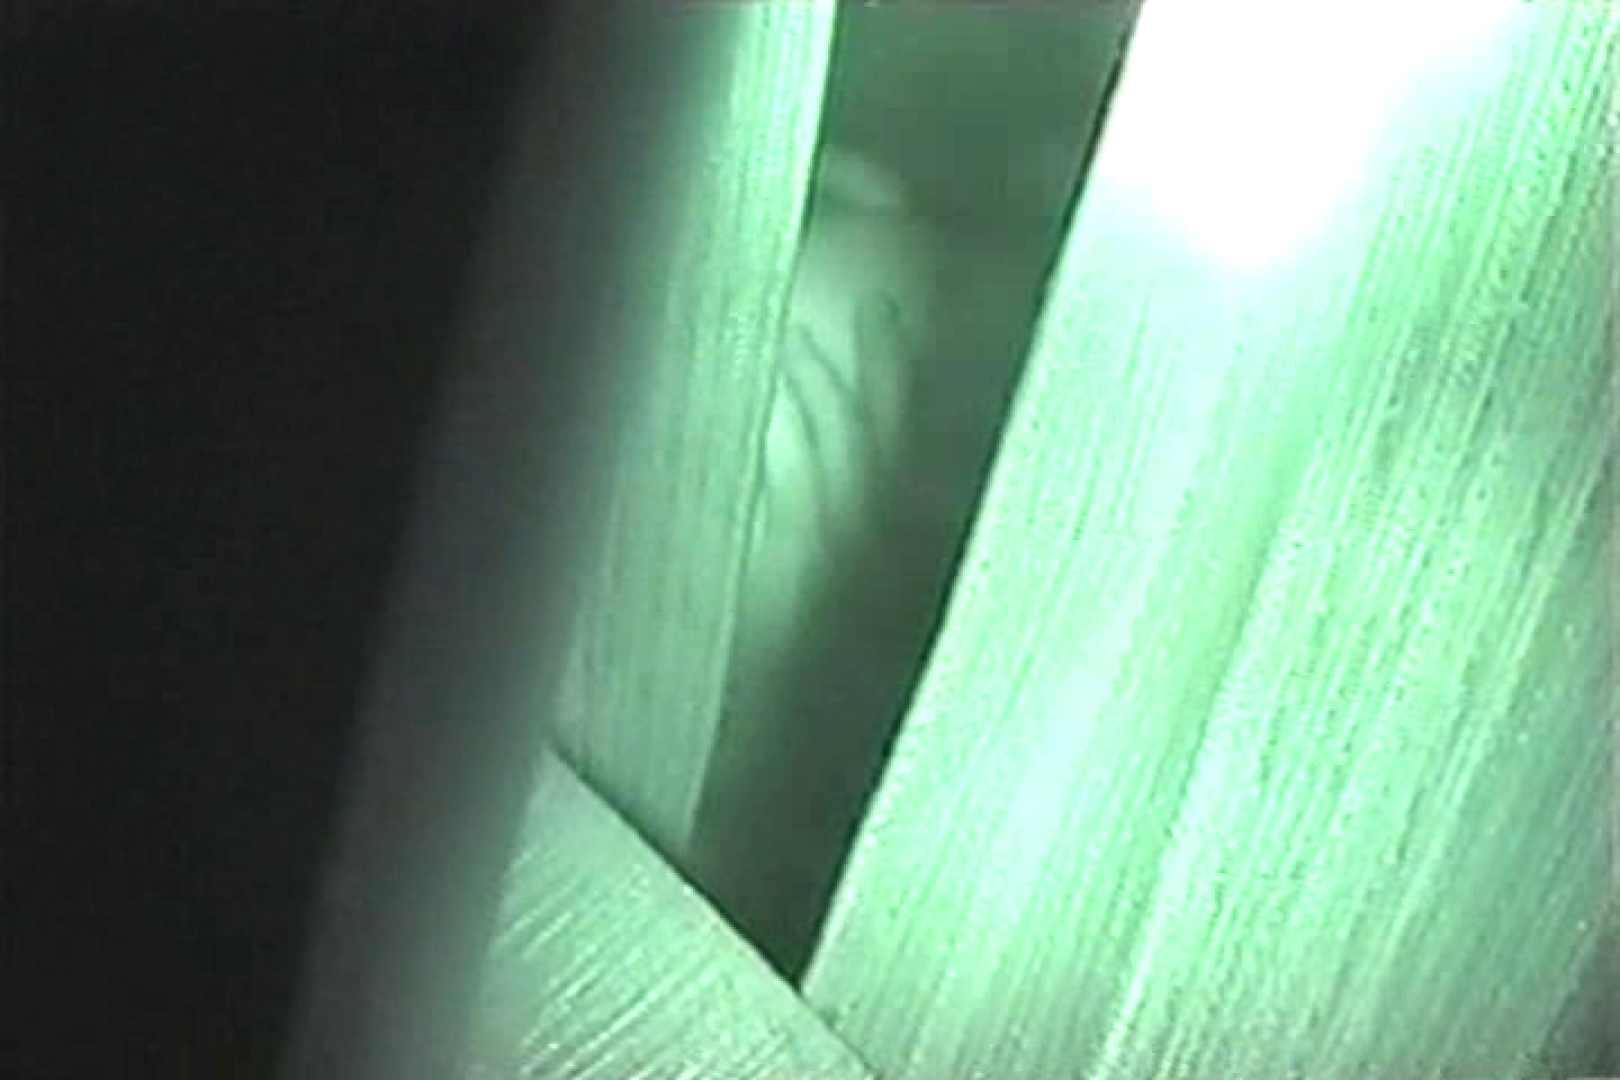 MASAさんの待ち伏せ撮り! 赤外線カーセックスVol.18 OLエロ画像 盗み撮りAV無料動画キャプチャ 64PICs 17